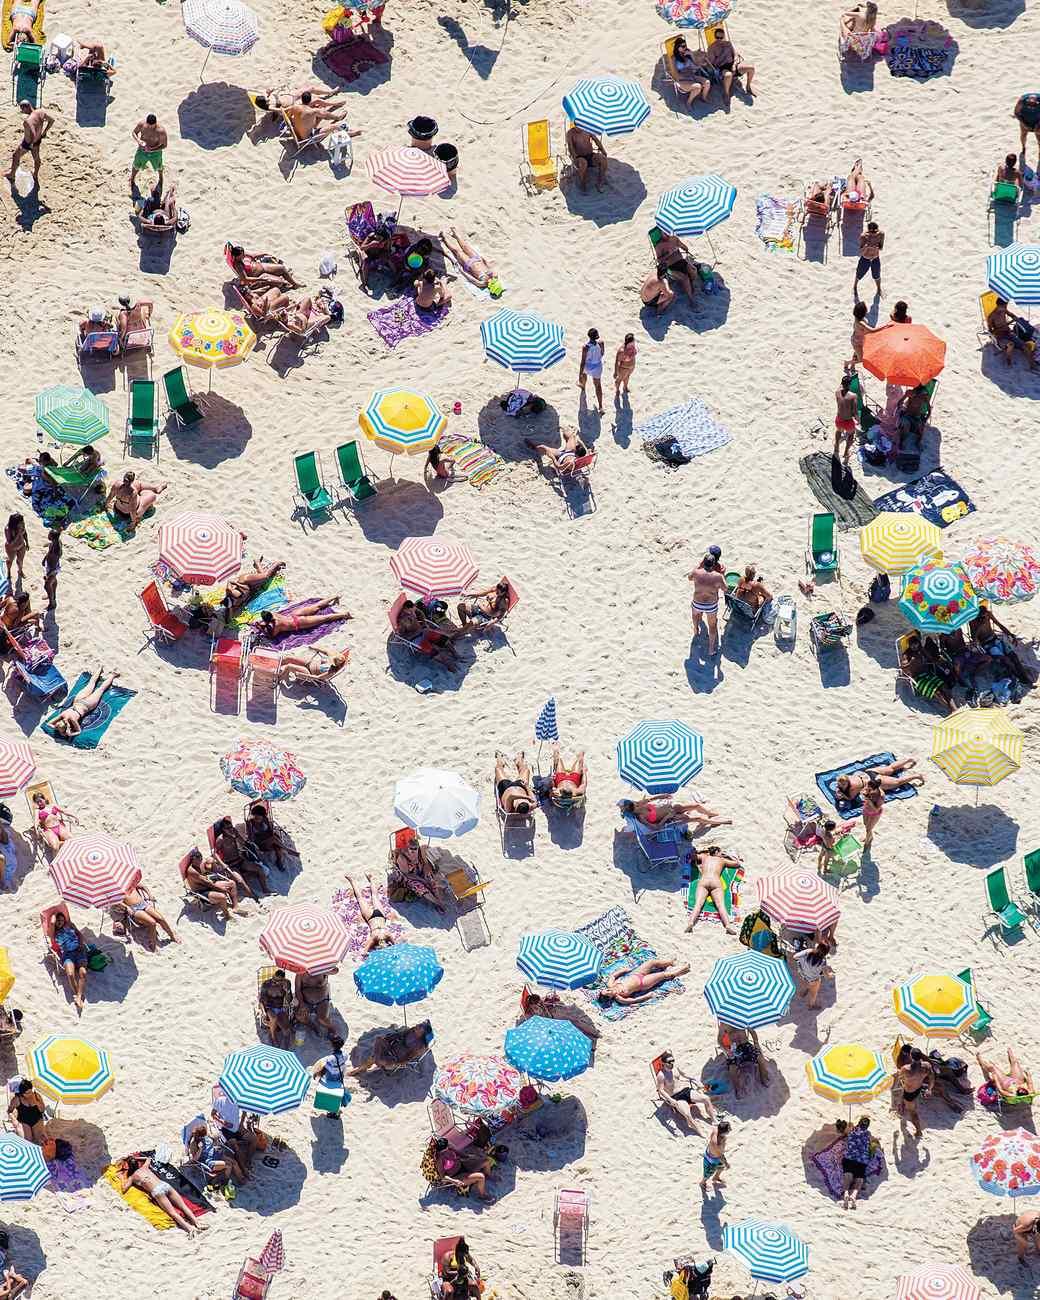 beaches_p079.jpg